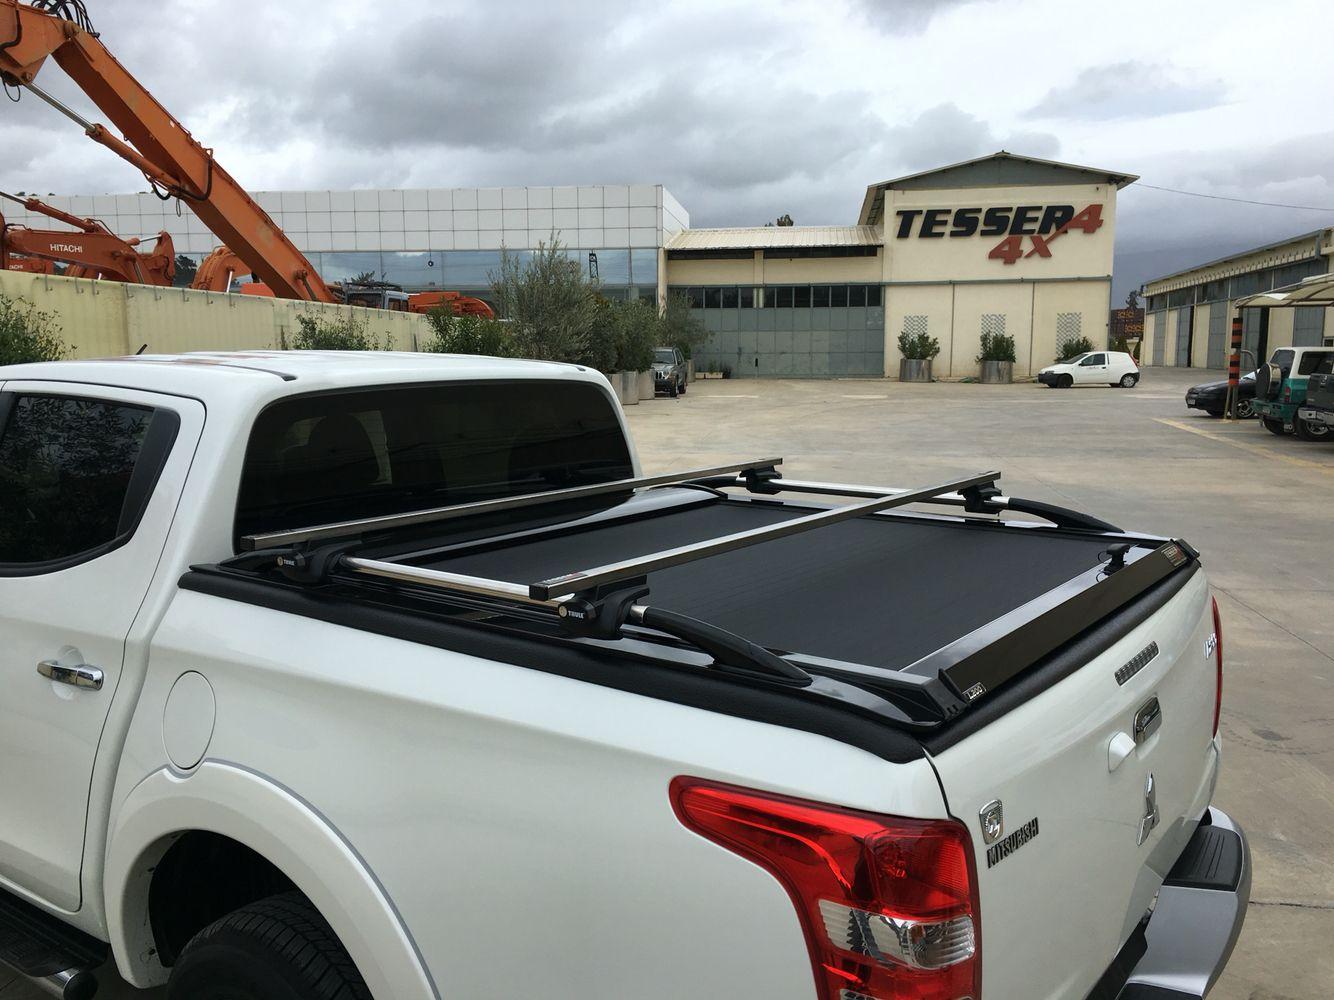 Mitsubishi L200 Triton 4x4 Accessories By Tessera4x4 Triton 4x4 Pickup Accessories Truck Bed Accessories